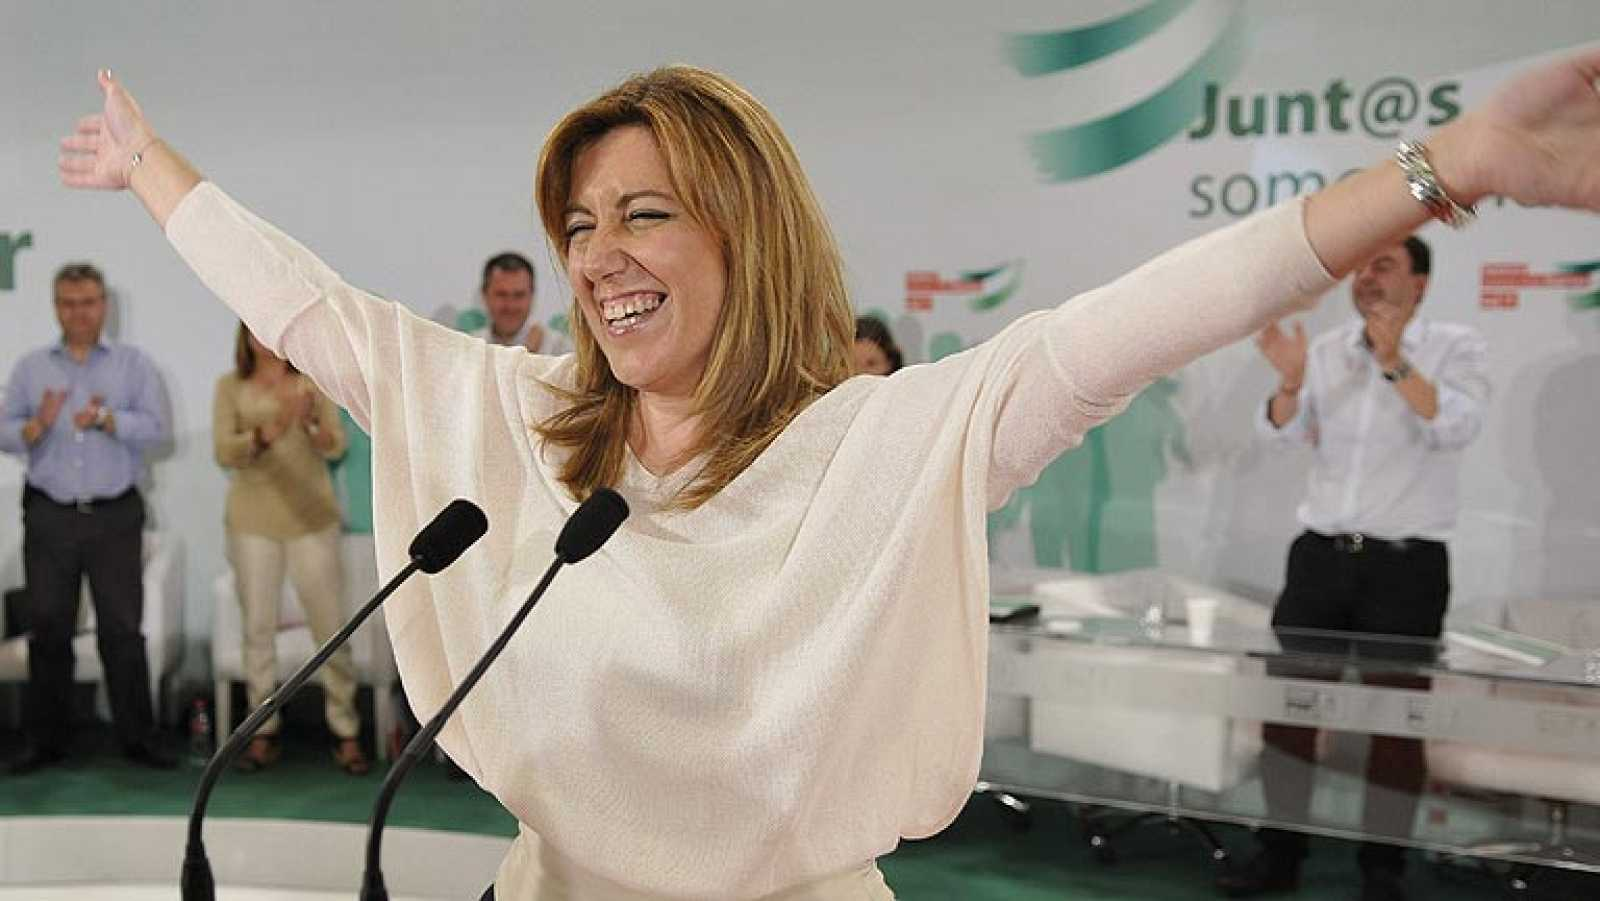 Susana Díaz se compromete a agotar la legislatura con IU en Andalucía